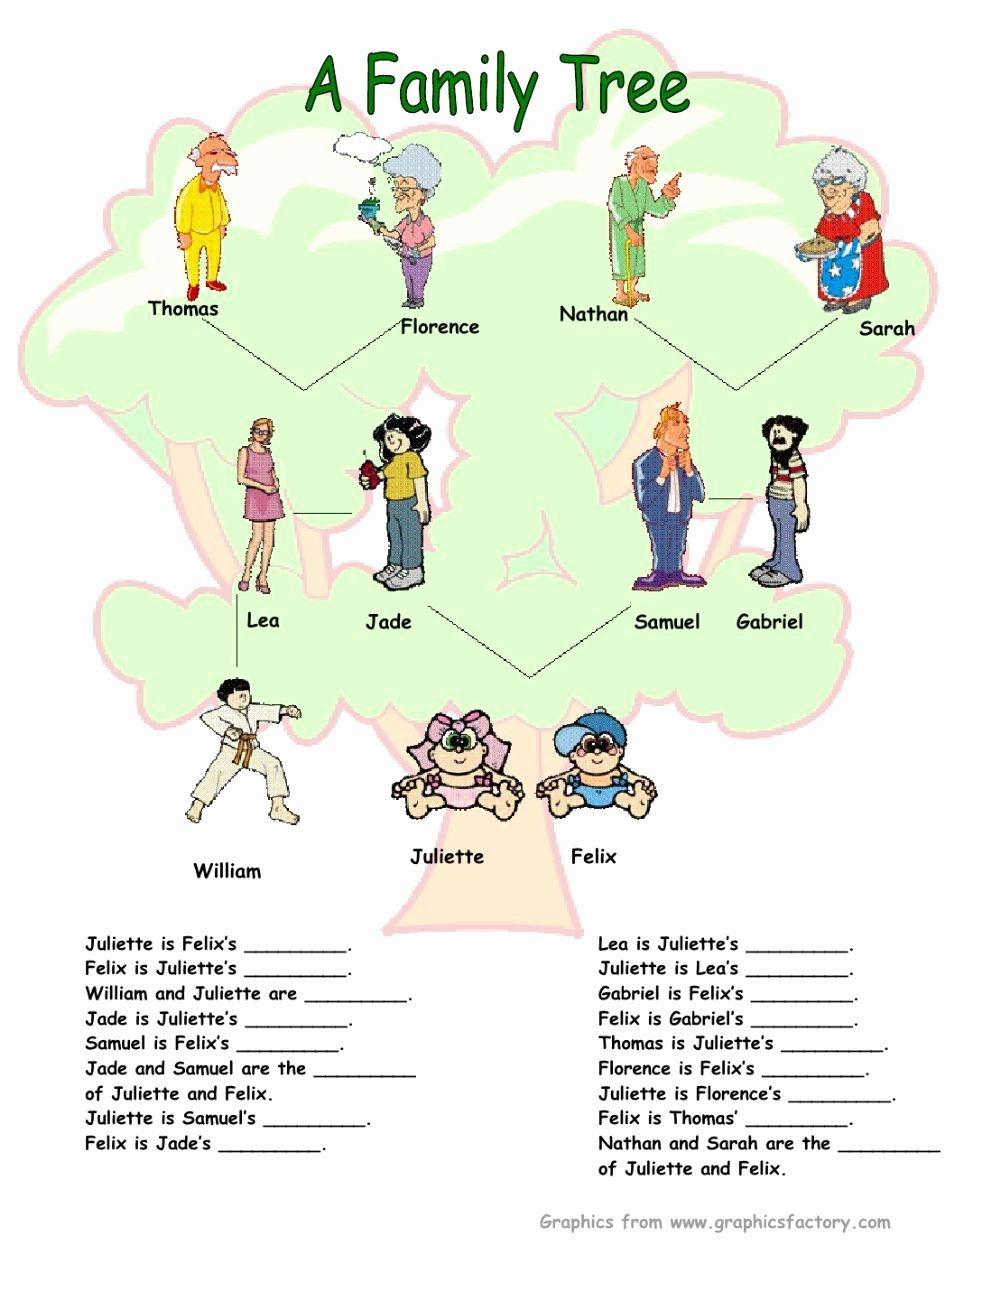 Family Tree Worksheet Printable Elegant Family Tree Interactive Worksheet